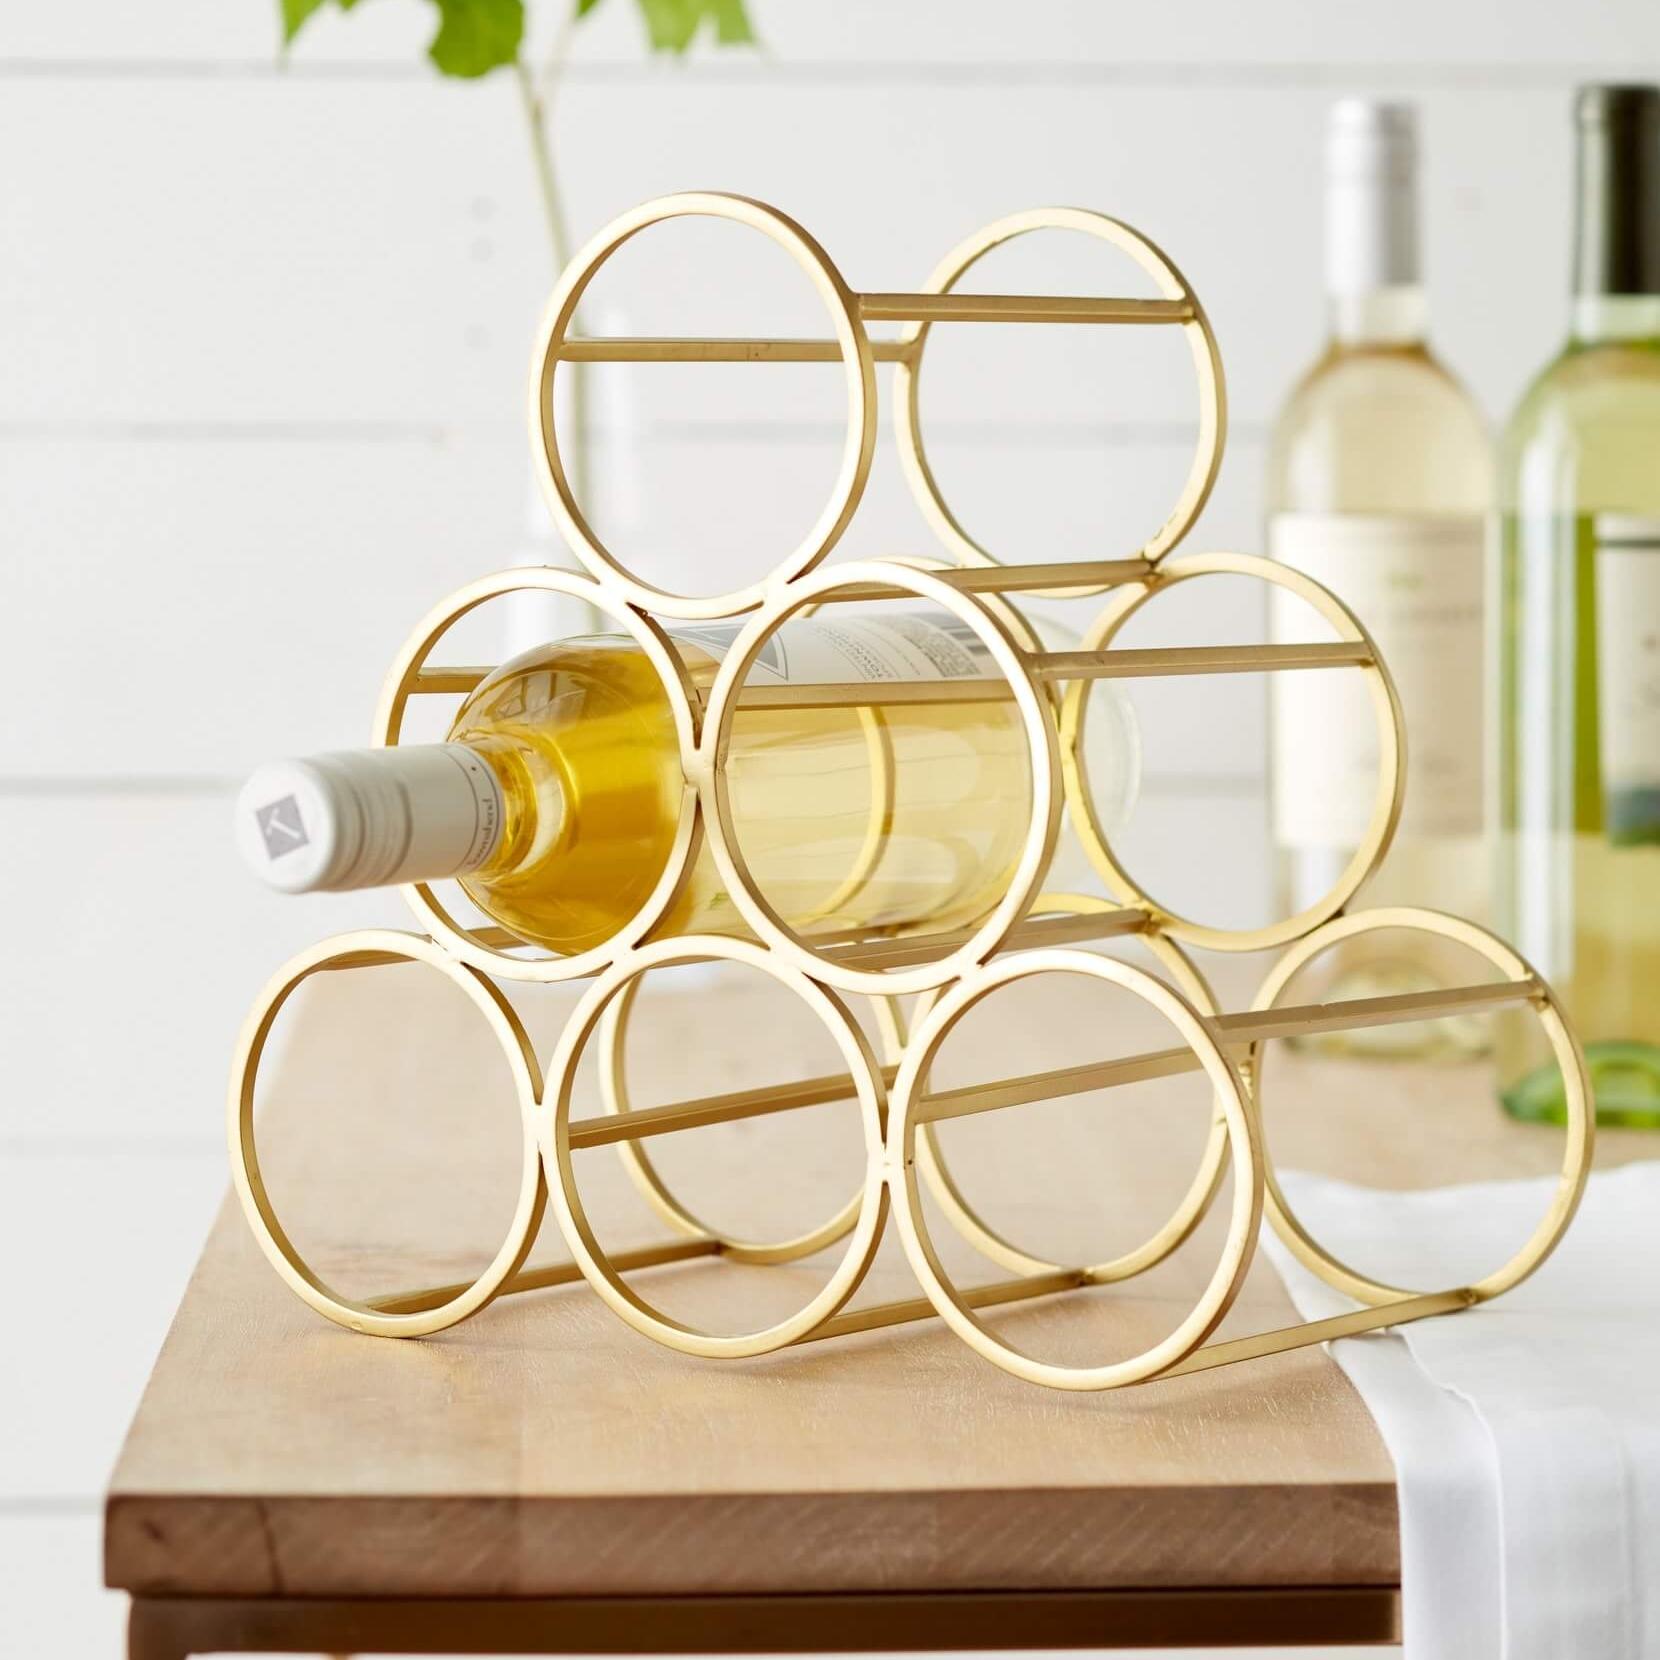 Nordstrom at Home Goldtone Wine Rack Nordstrom Anniversary Sale